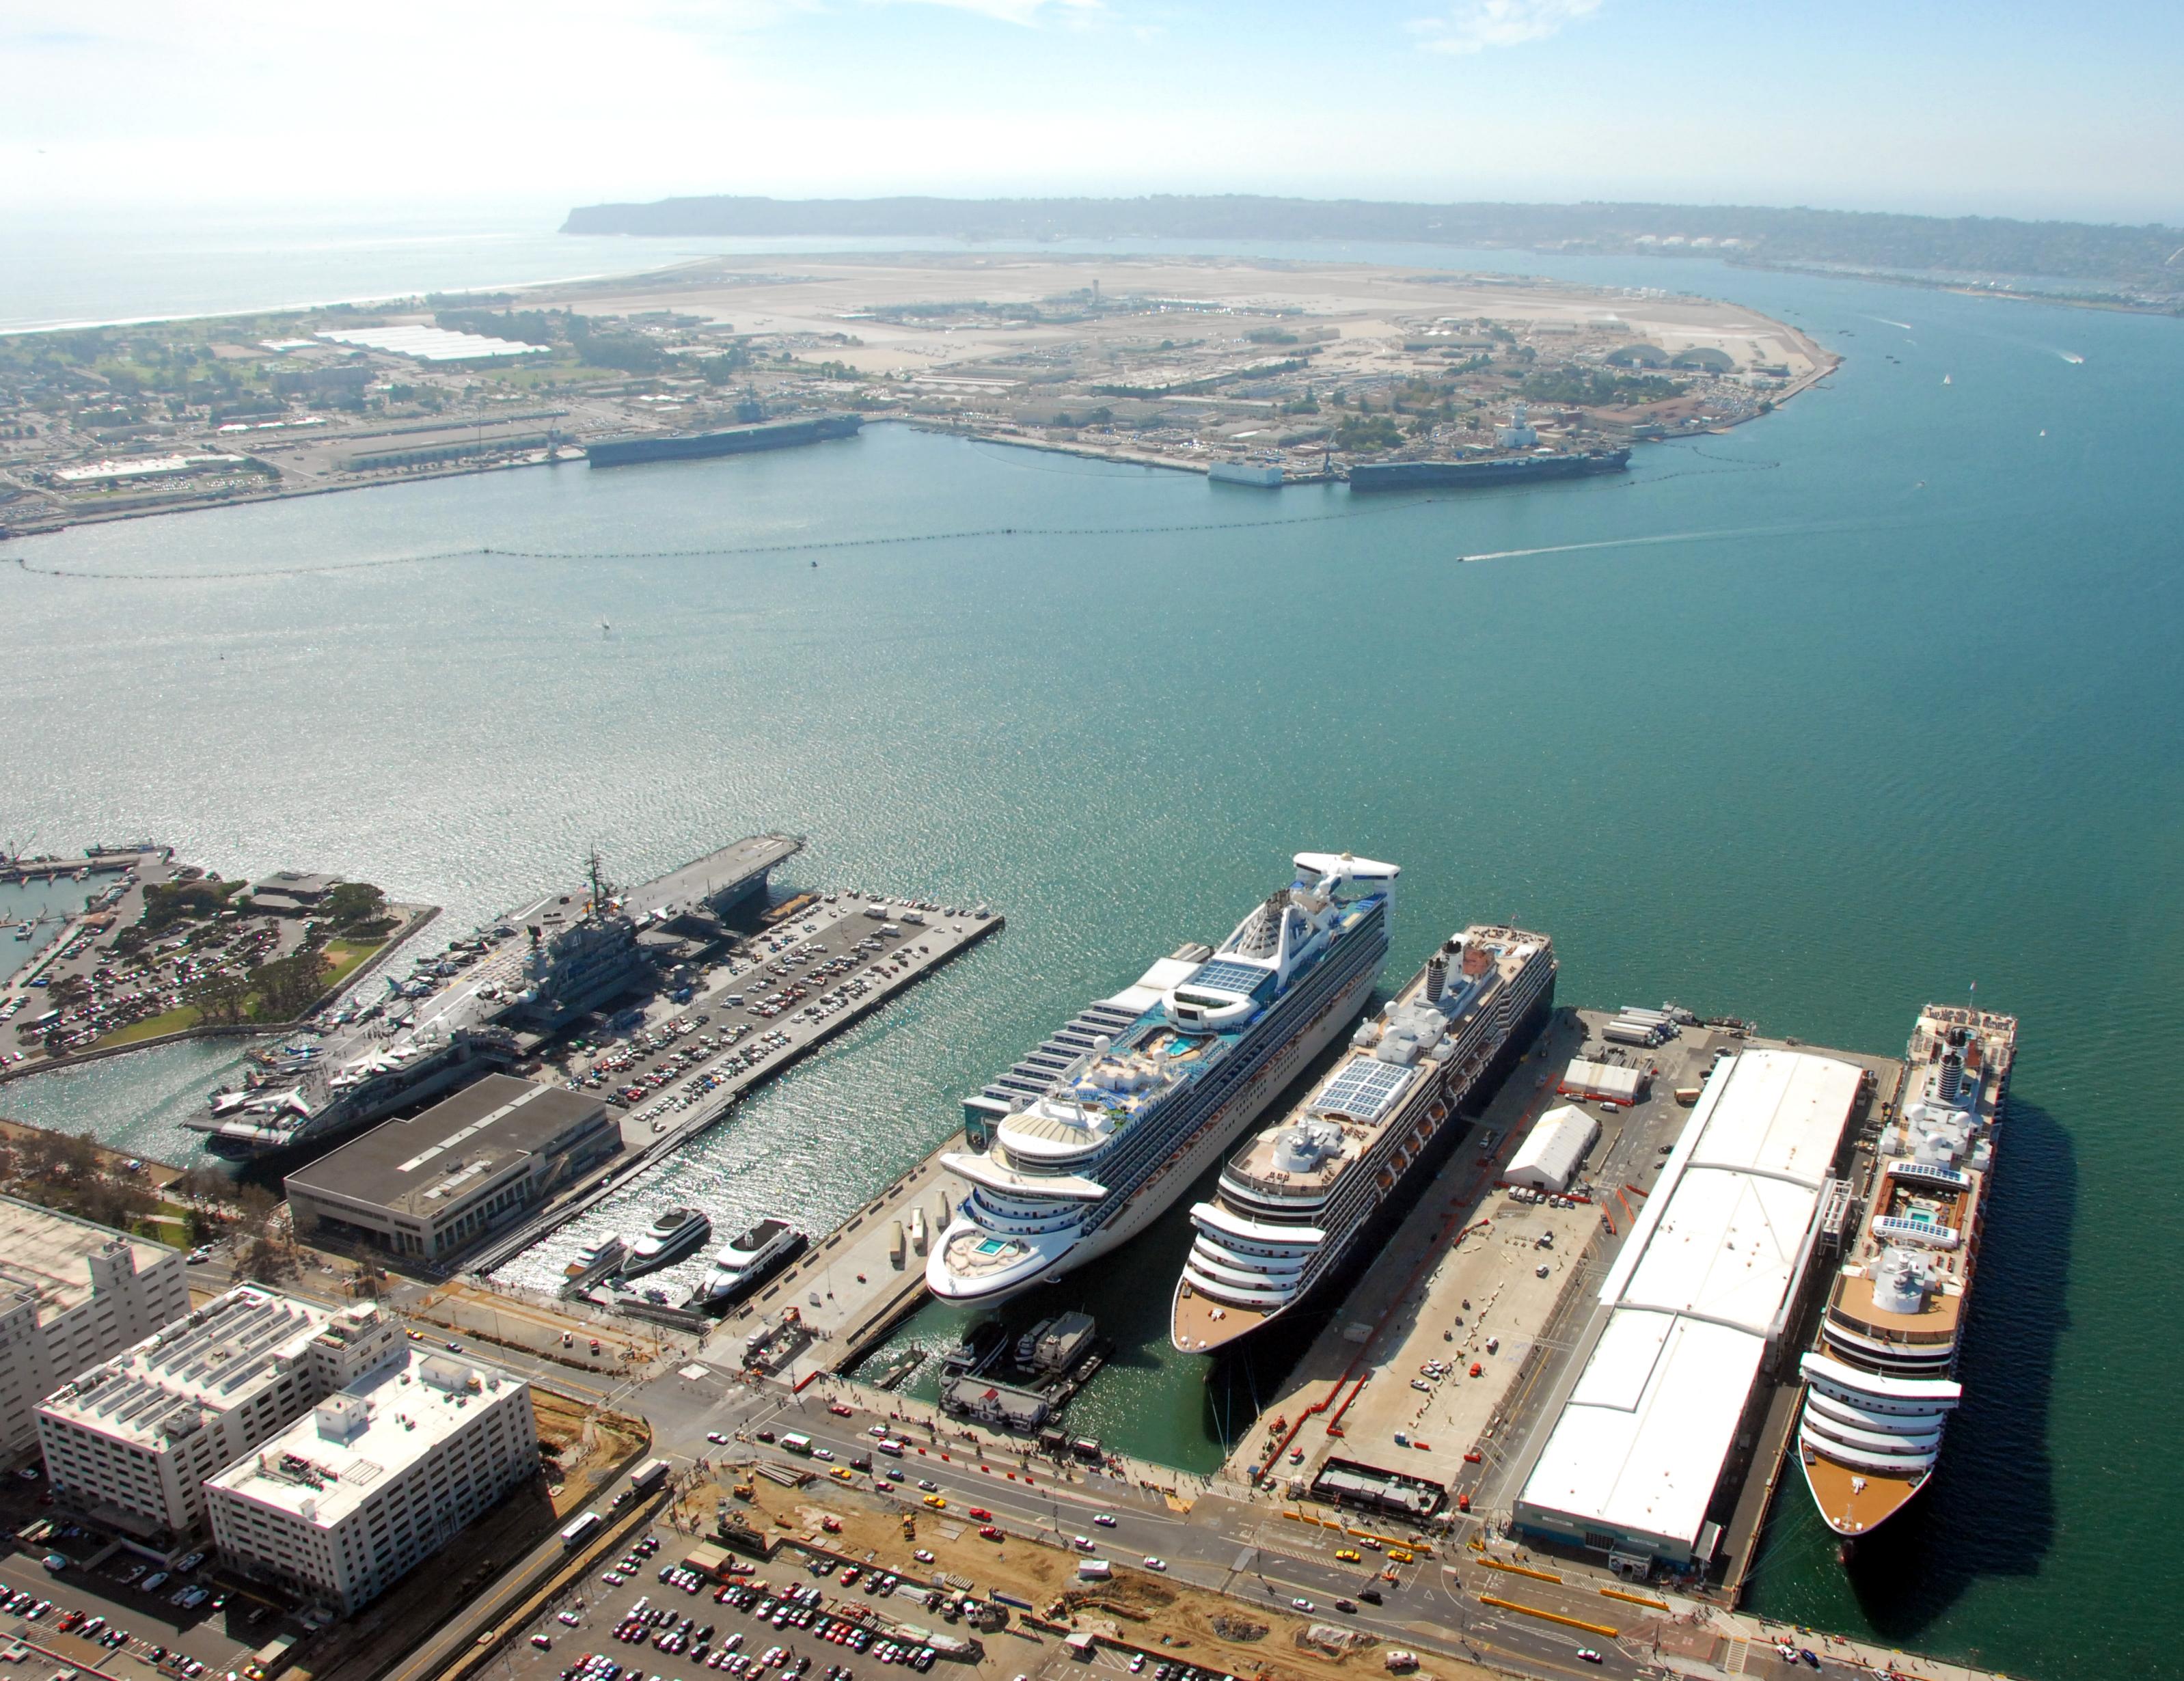 FileCruise Ships Visit Port Of San Diego Jpg Wikimedia Commons - Cruise ship ports east coast